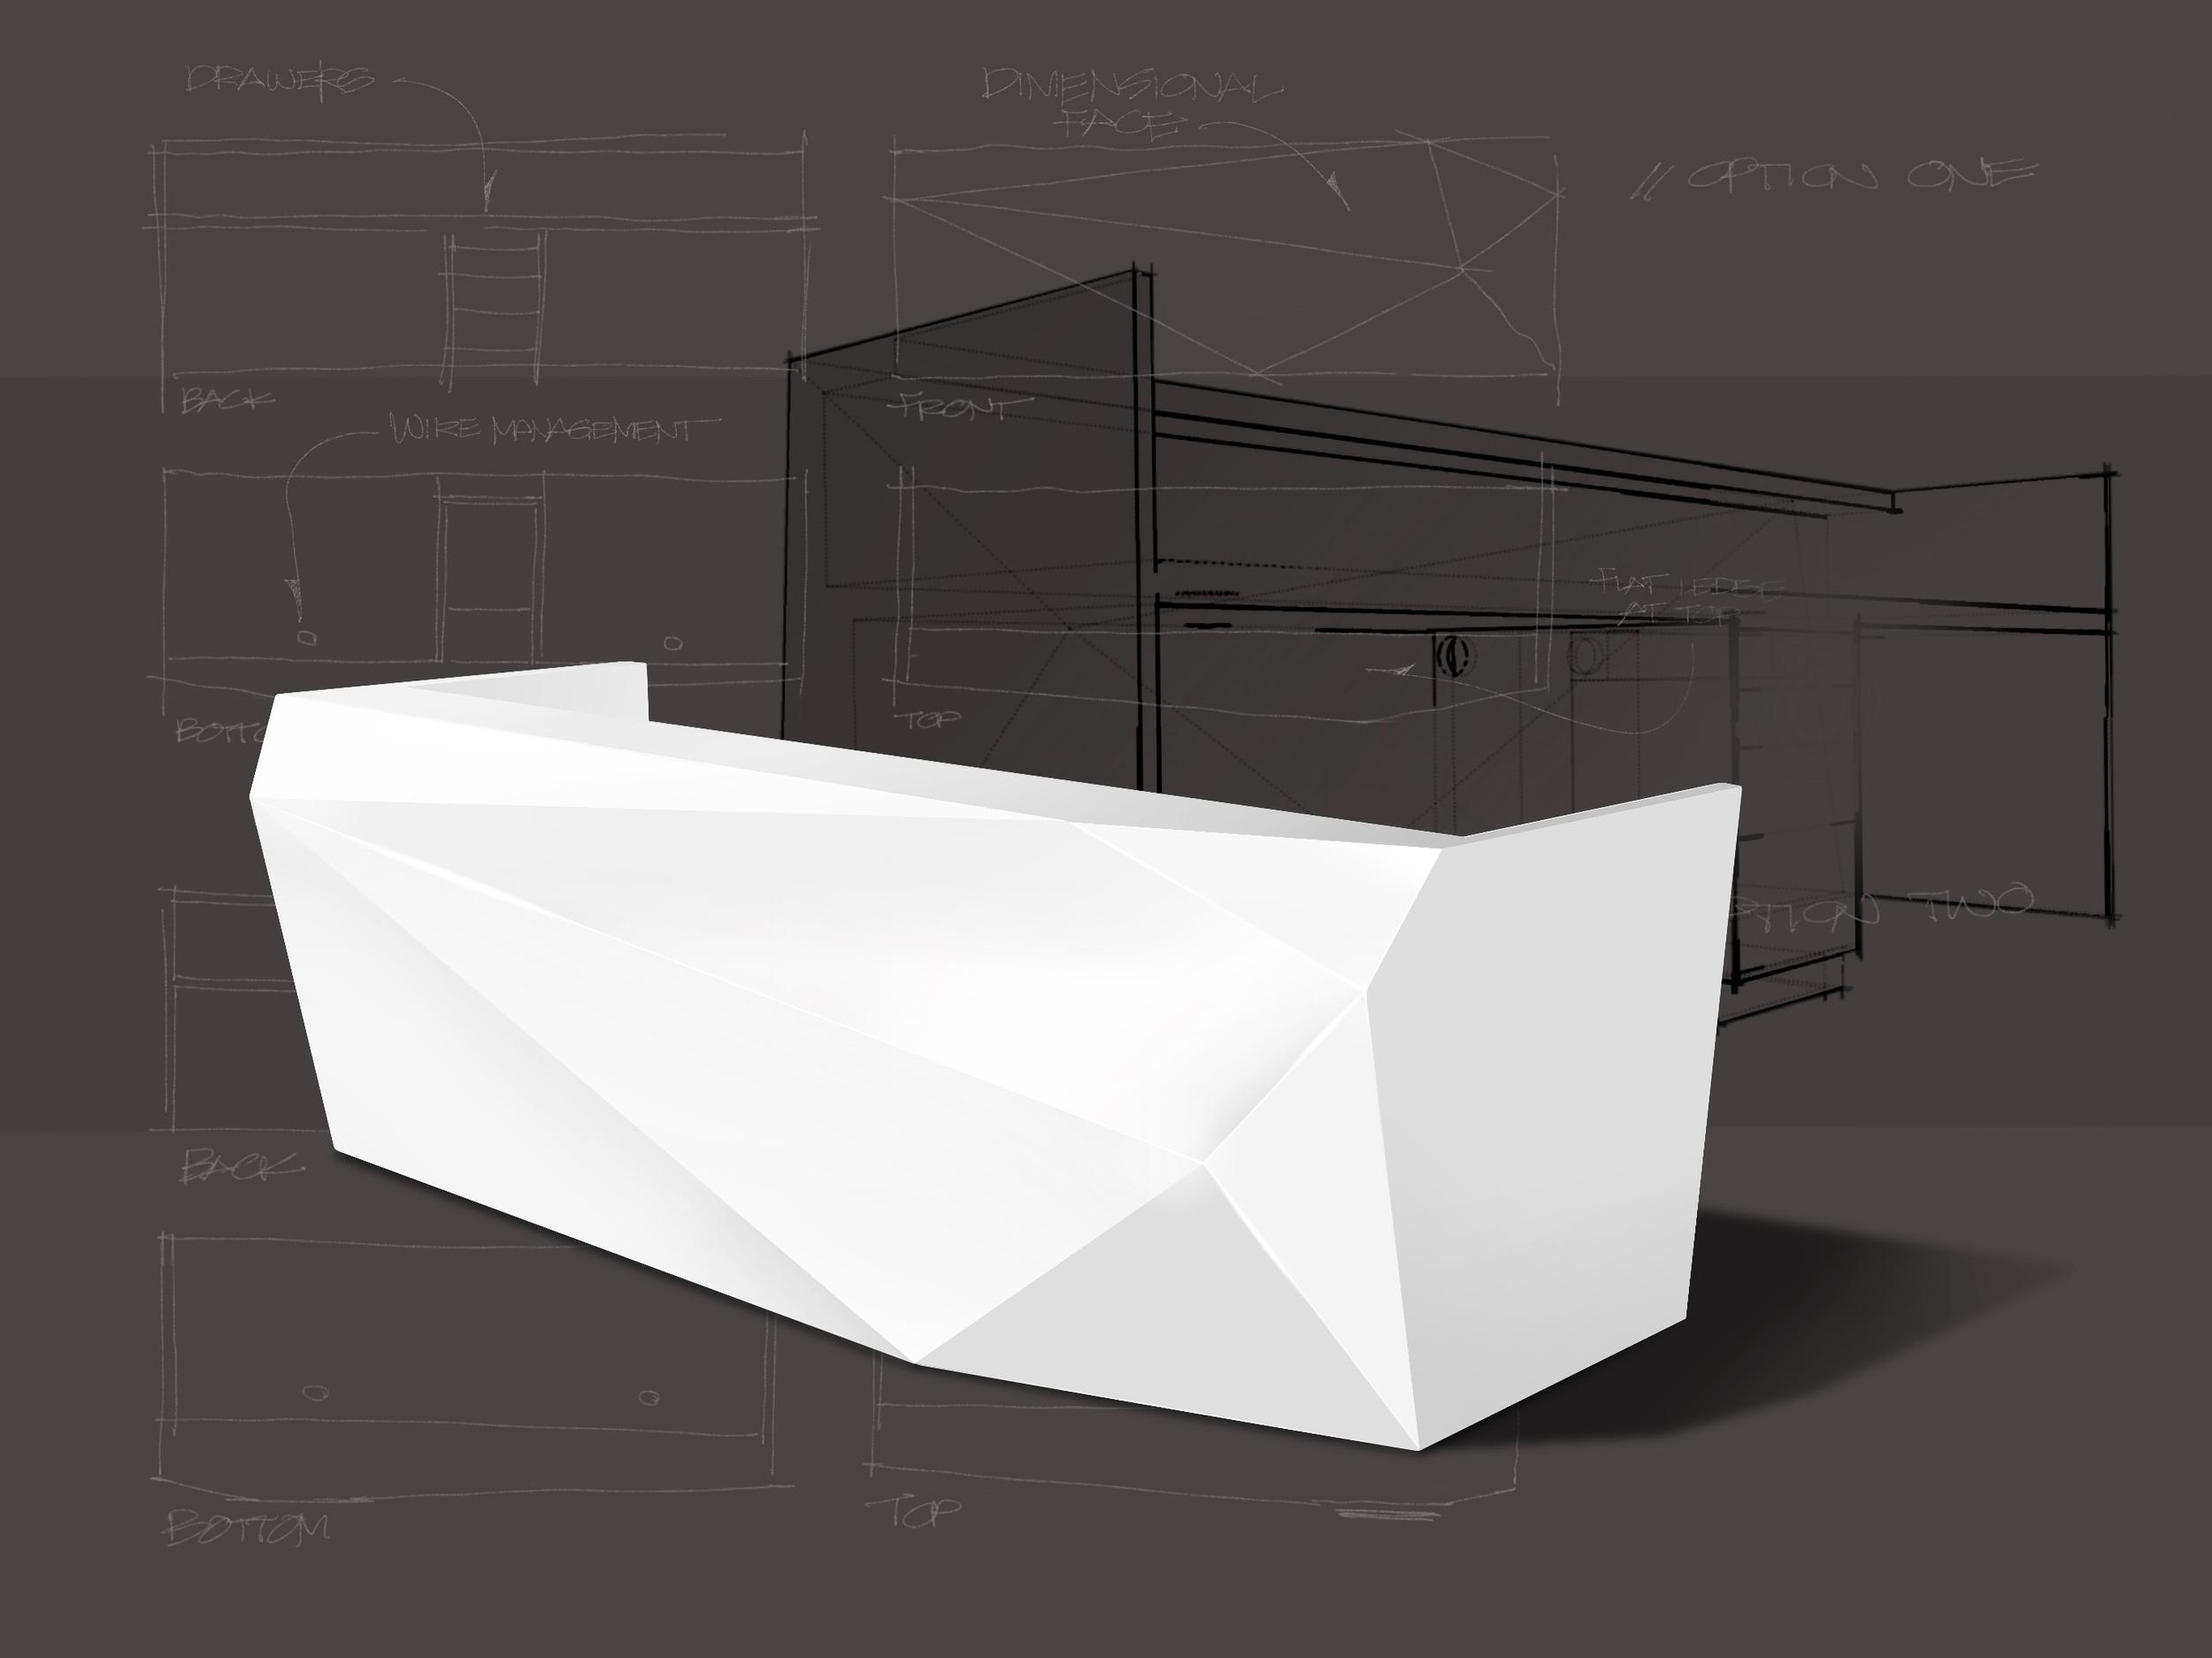 SET6674 SET Internal New Office_RECEPTION DESK_Concept Drawing.jpeg